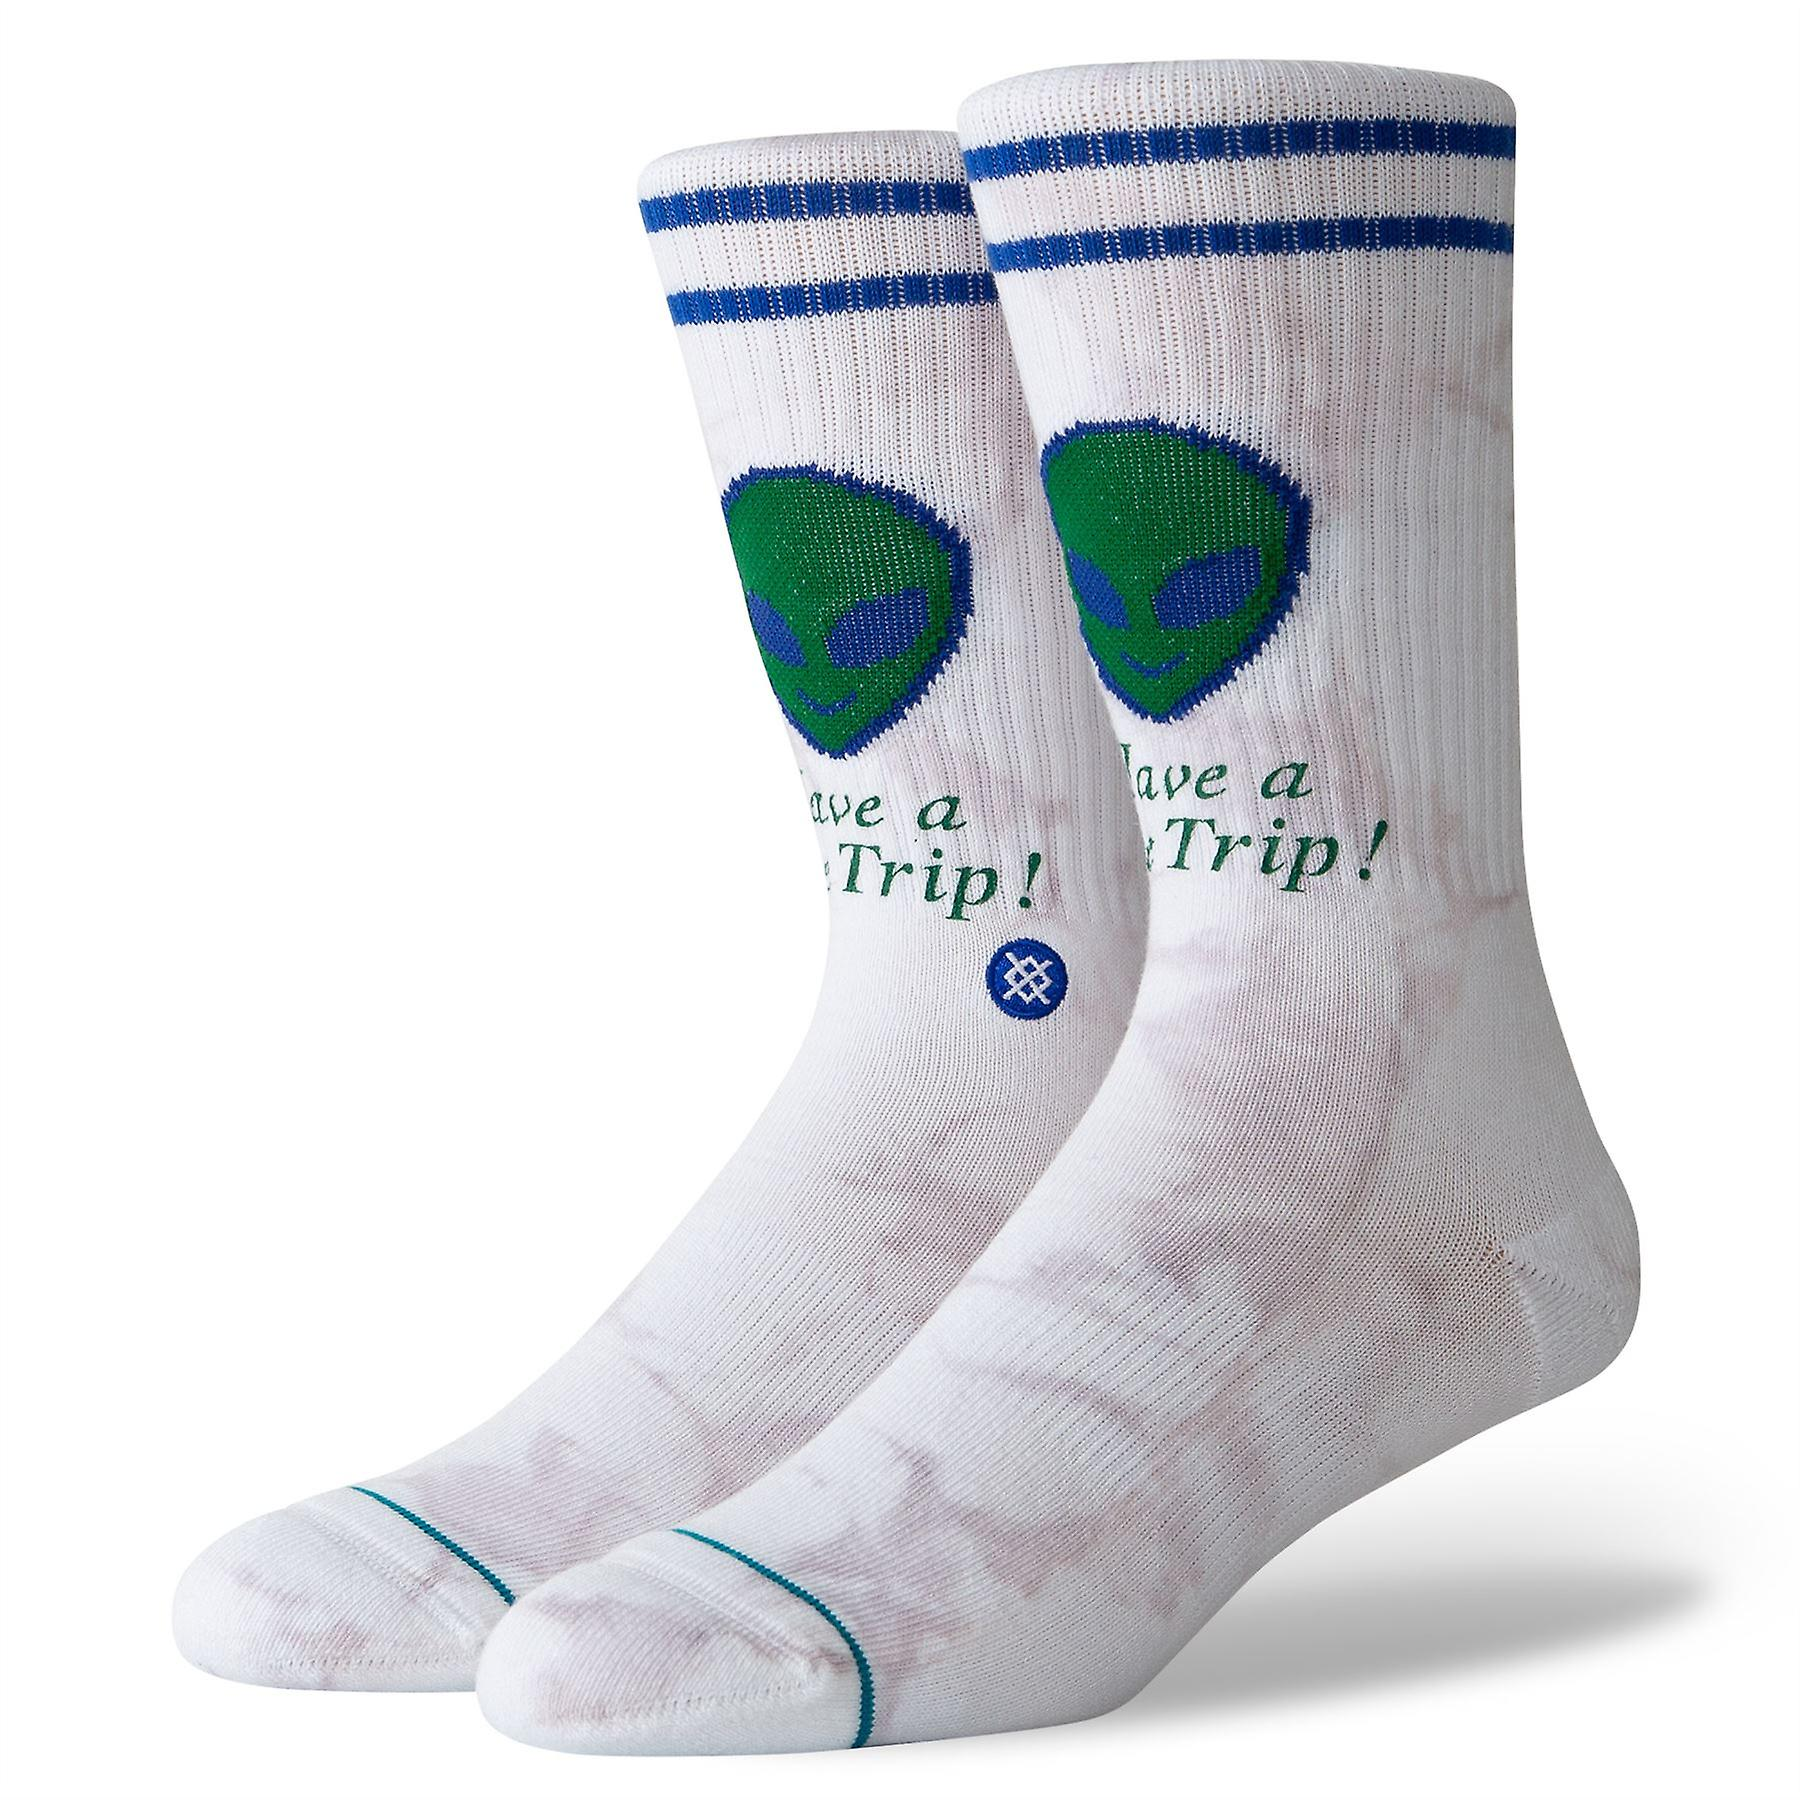 Stance Lifestyle Mens Socks ~ Space Trip (size L)